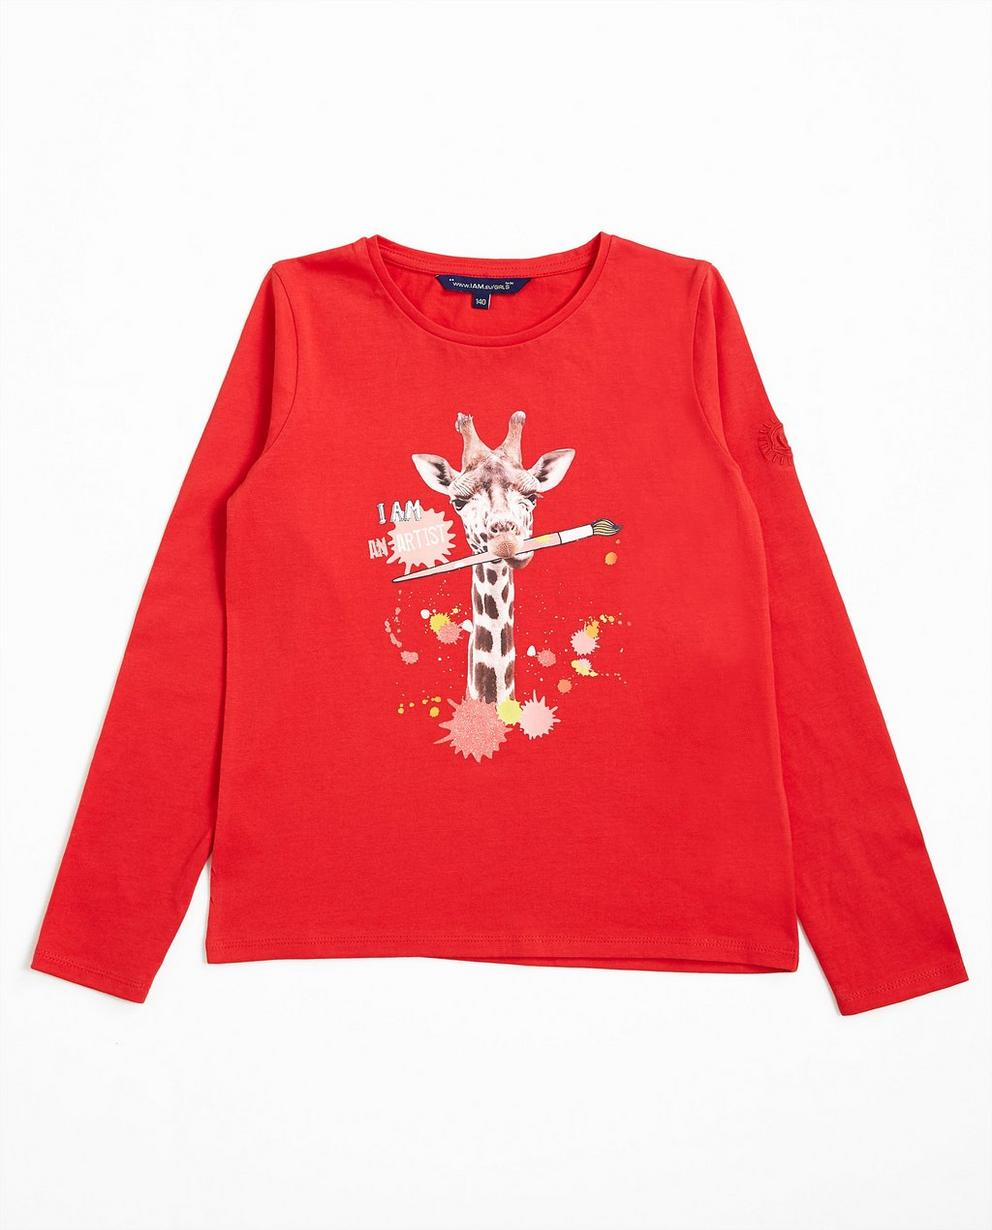 Longsleeve Giraffenprint - in Rot, I AM - I AM